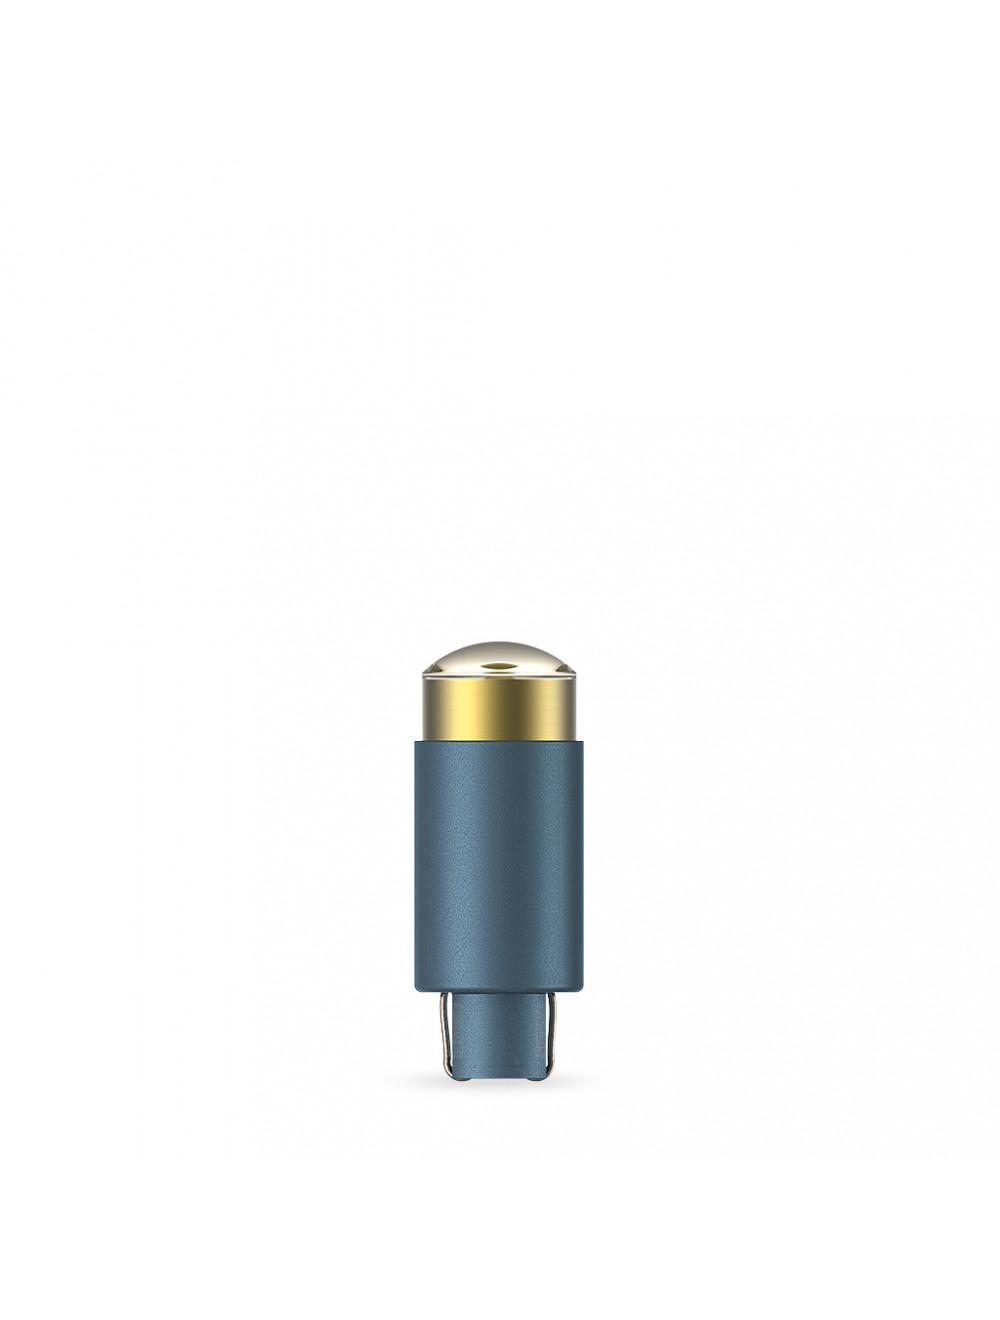 Das Produkt MK-dent LED Lampe BU8012NNL aus dem Global-dent online shop.